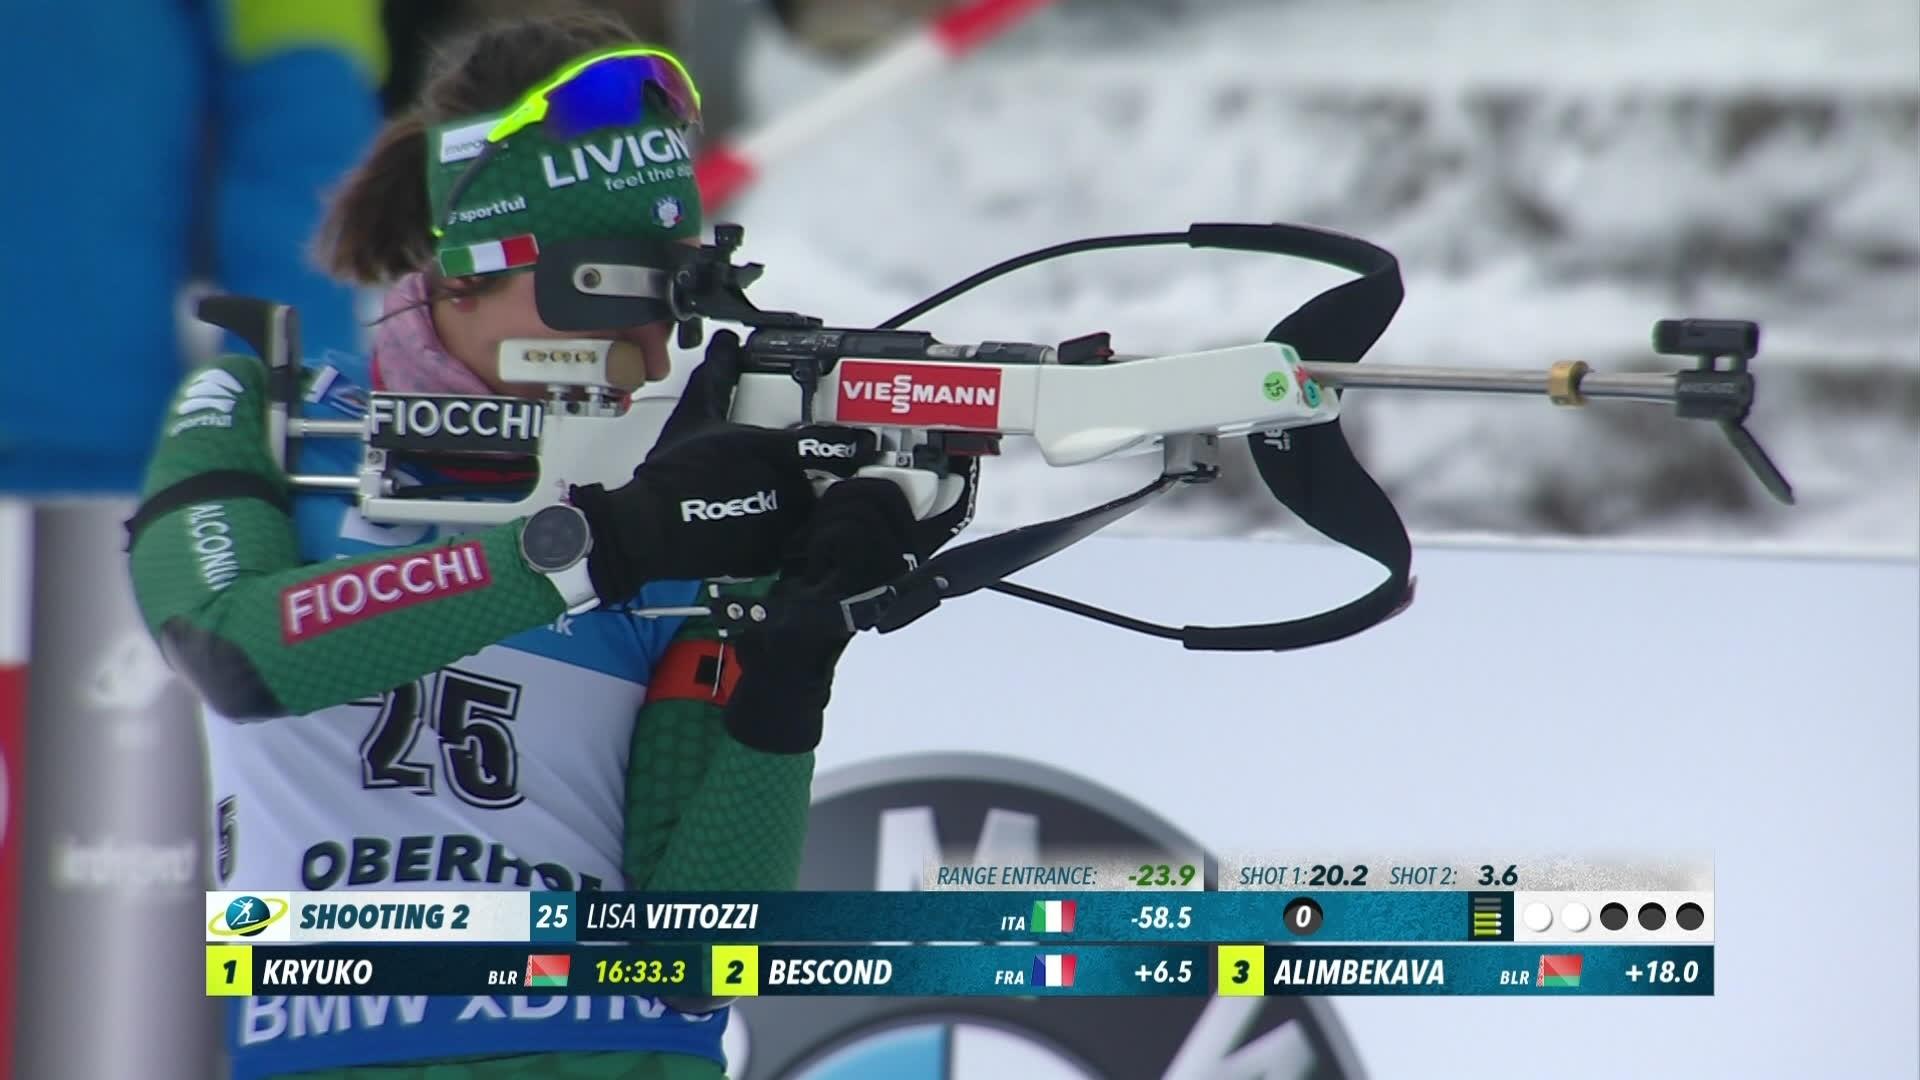 Biathlon : women's individual highlights in Oberhof